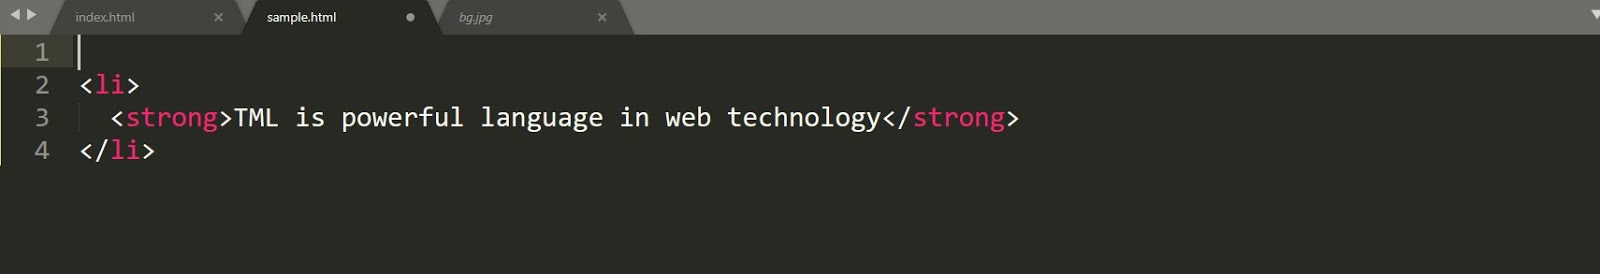 HTML Corrections